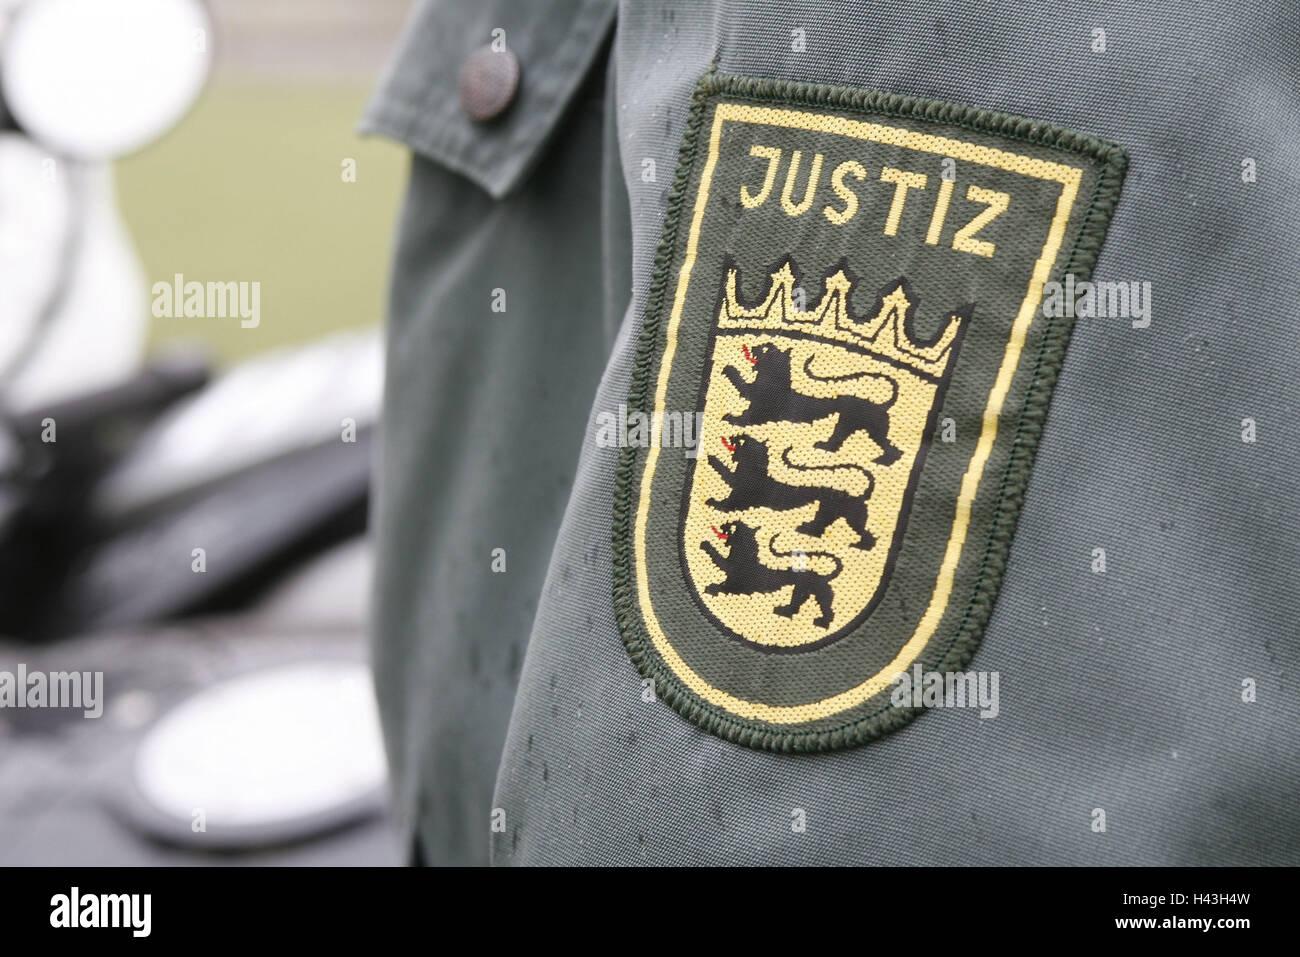 Uniformly, detail, badge, justice, Aufnäher, official, magistrate, uniform jacket, sleeve, official uniform, - Stock Image